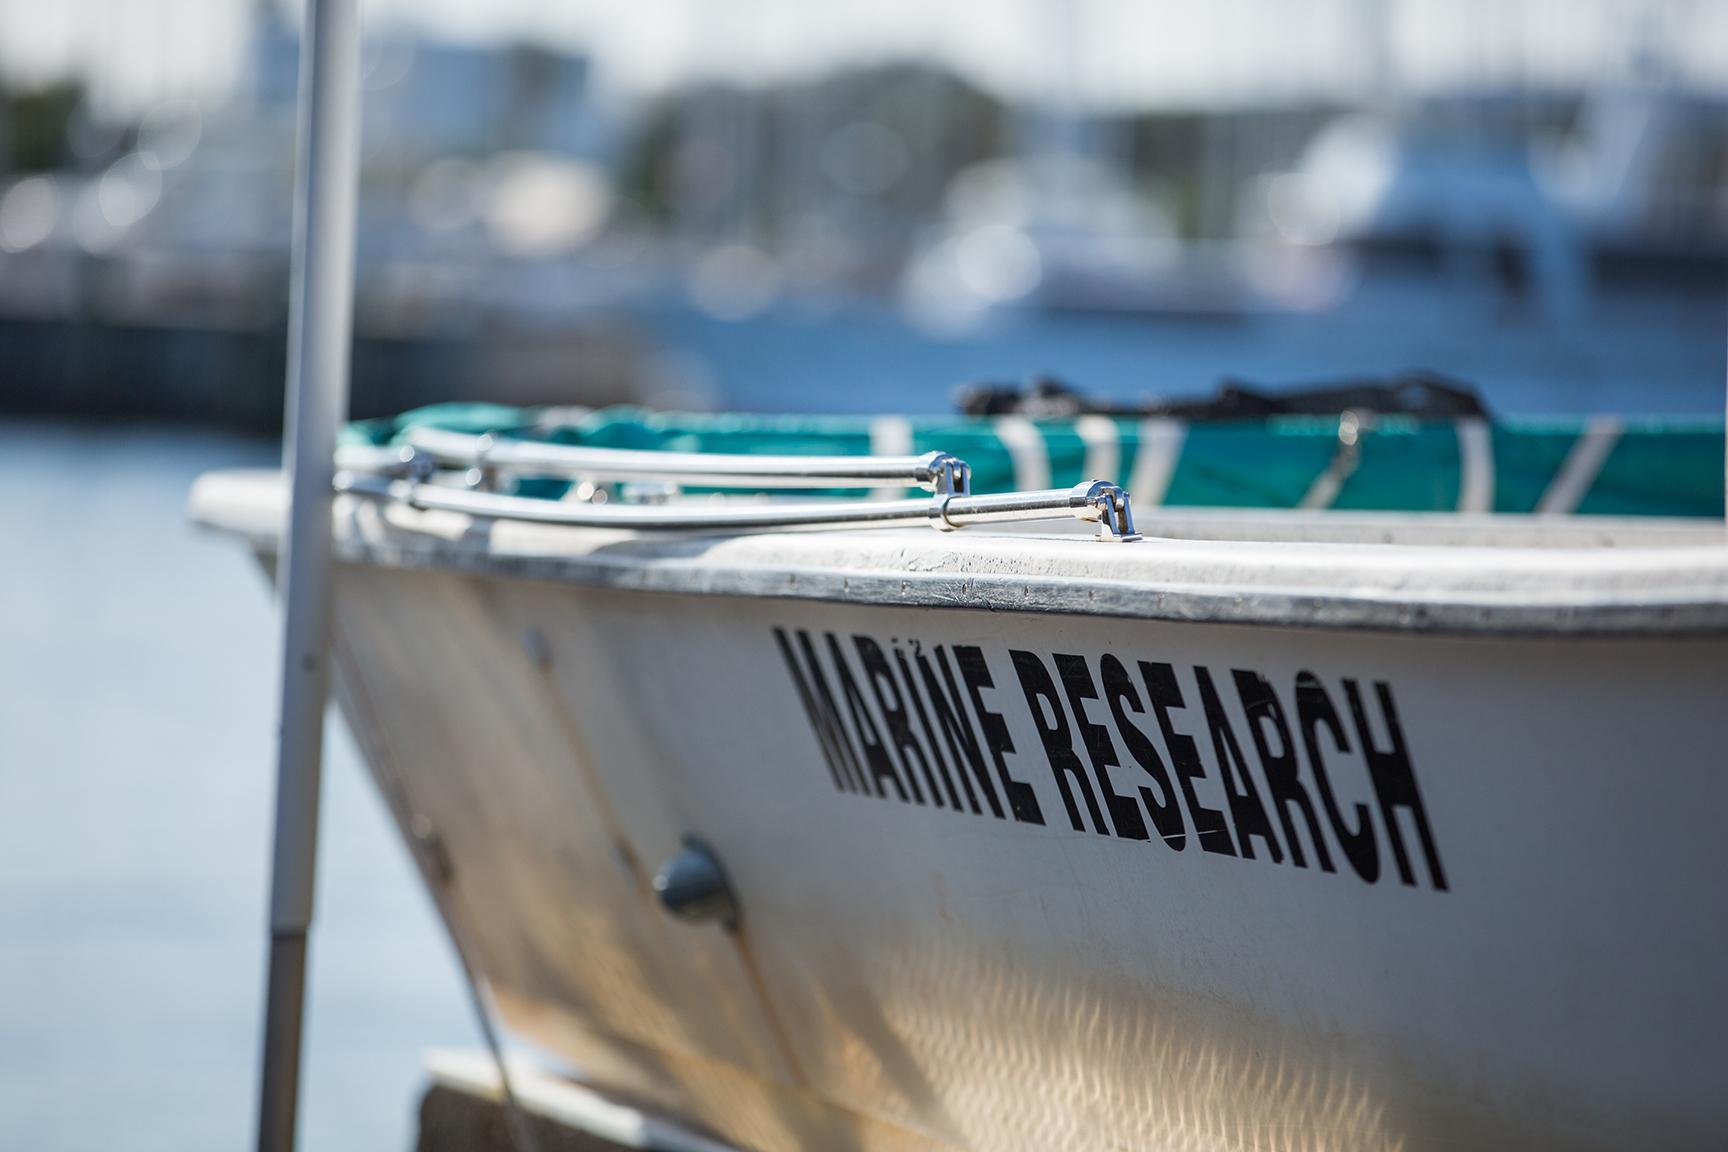 Marine Research boat